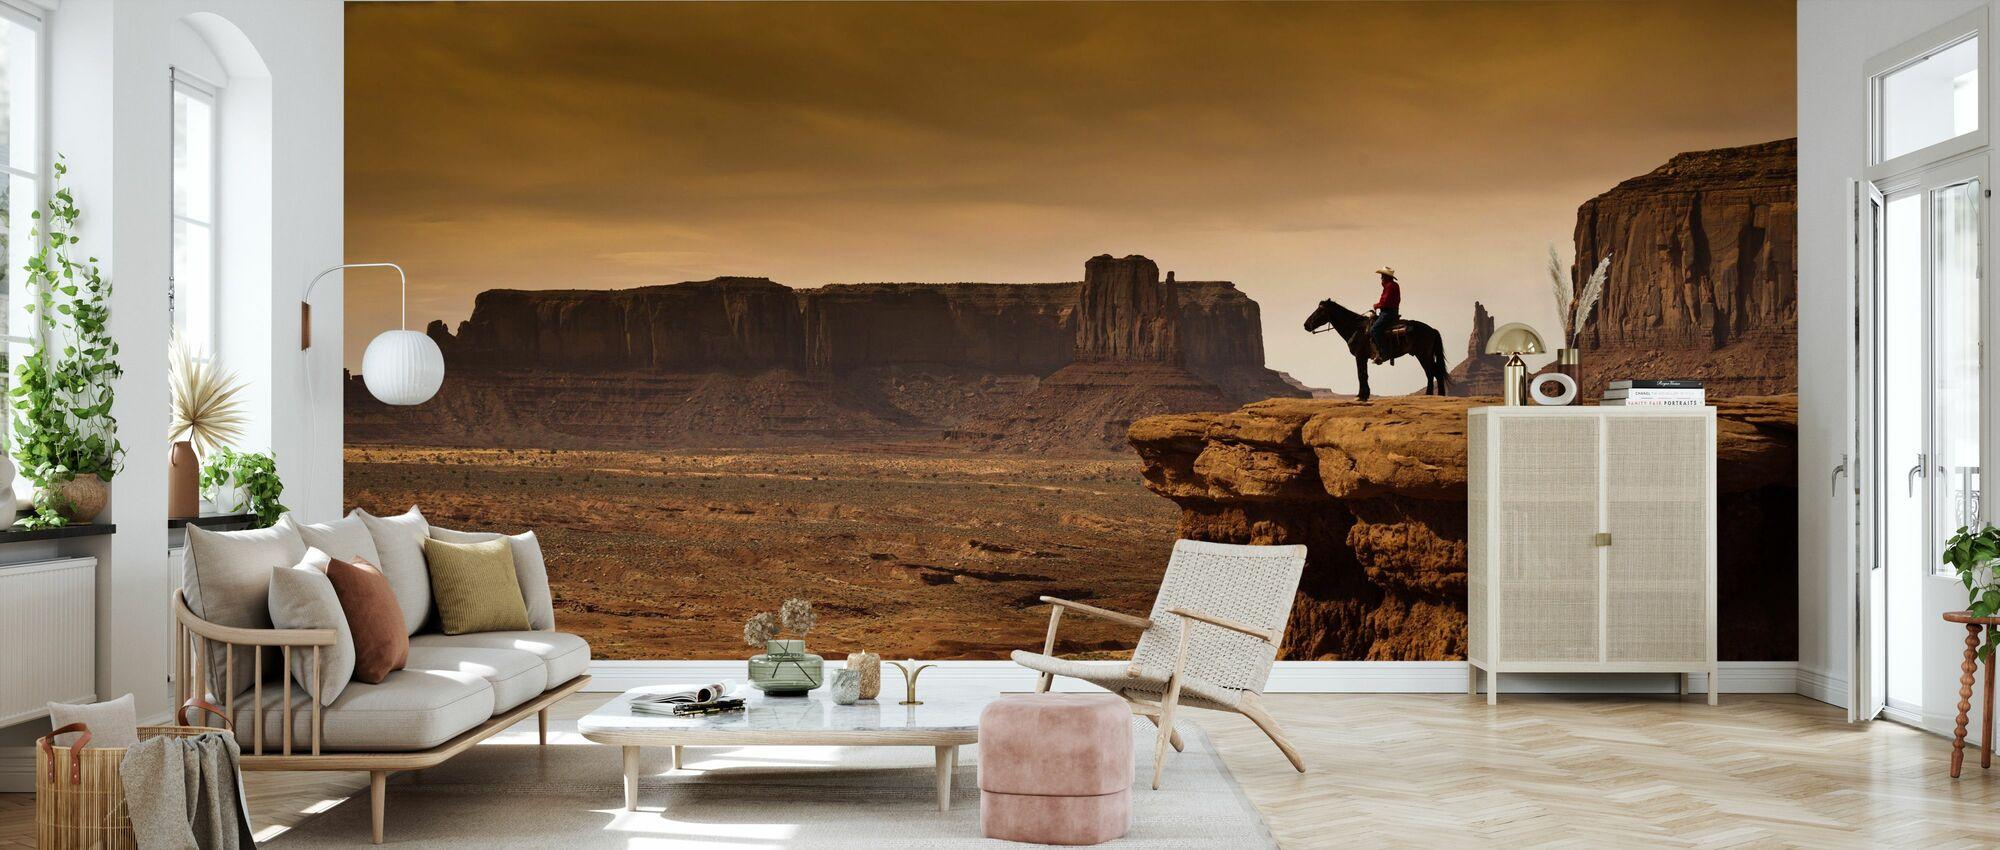 Cowboy in Valley Tribal - Wallpaper - Living Room